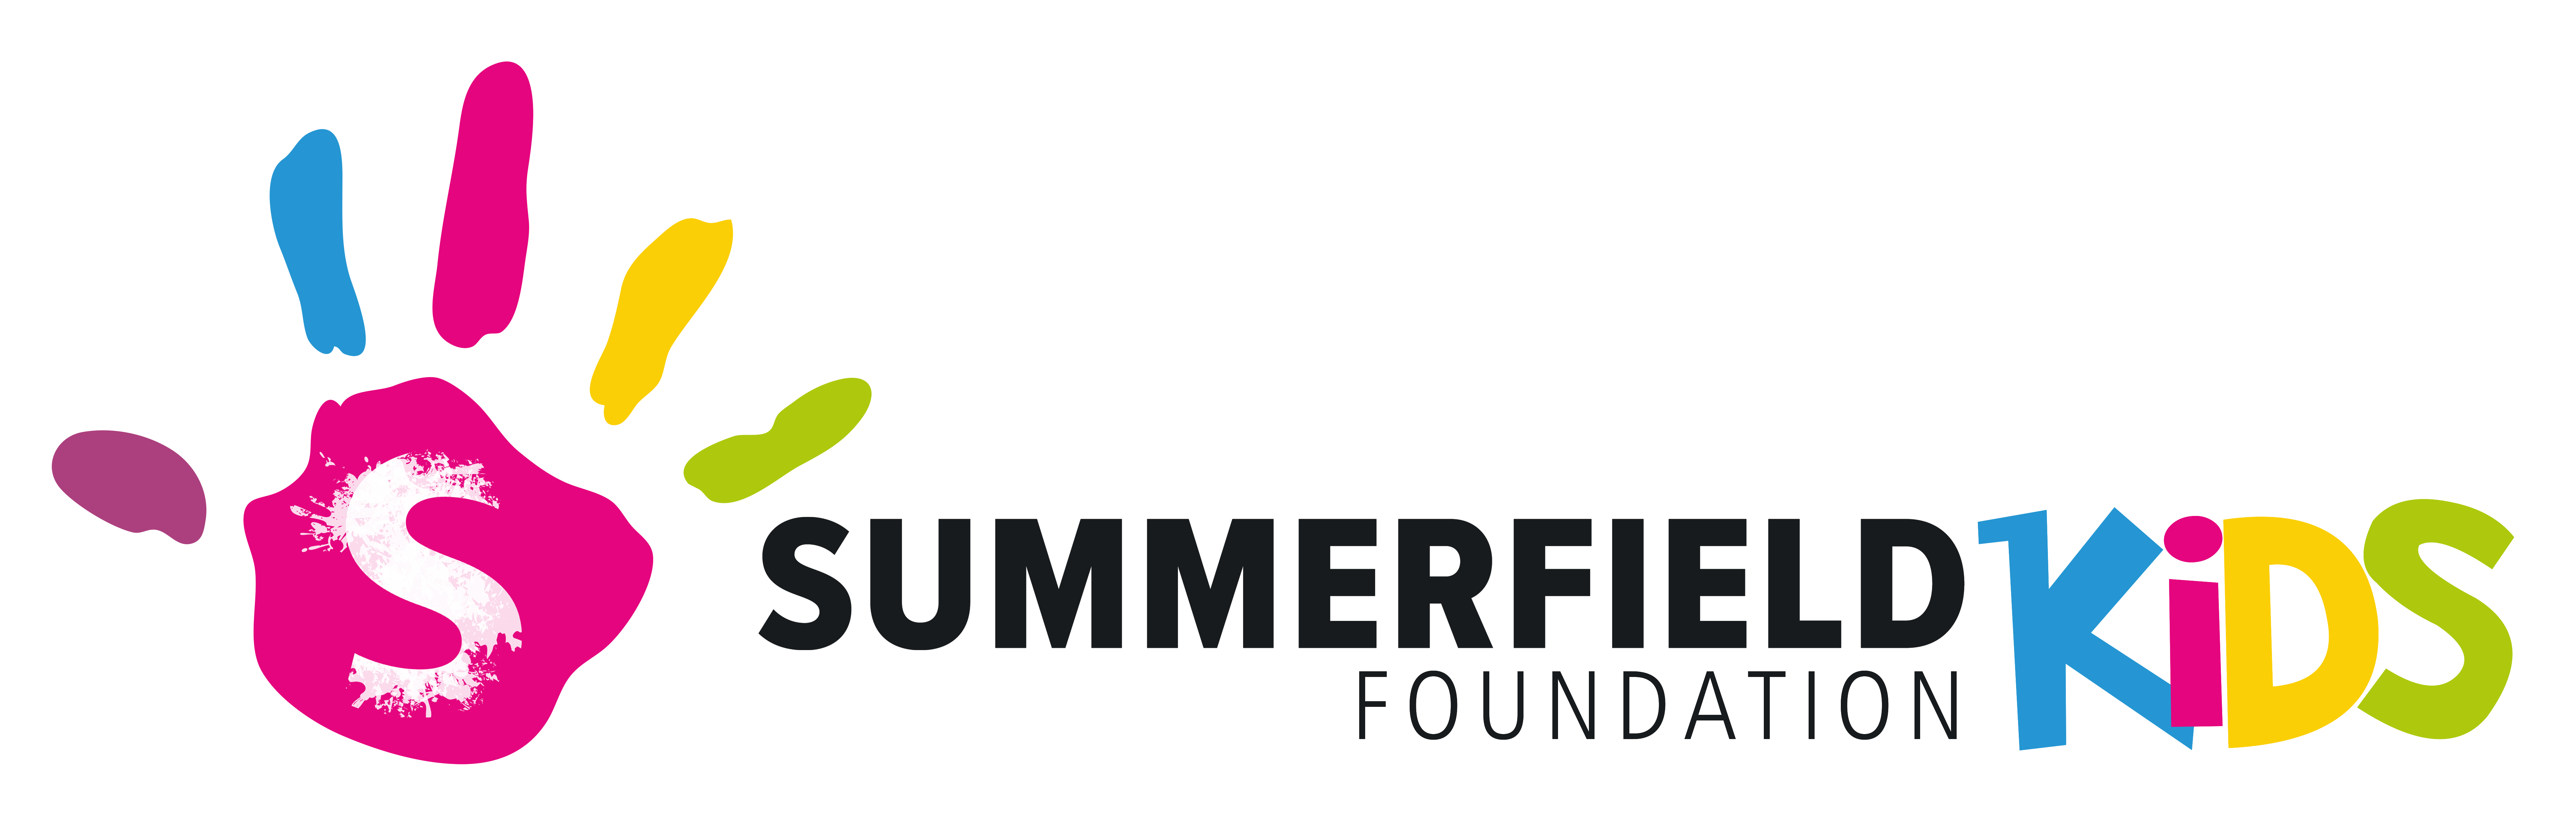 Summerfield Kids Foundation